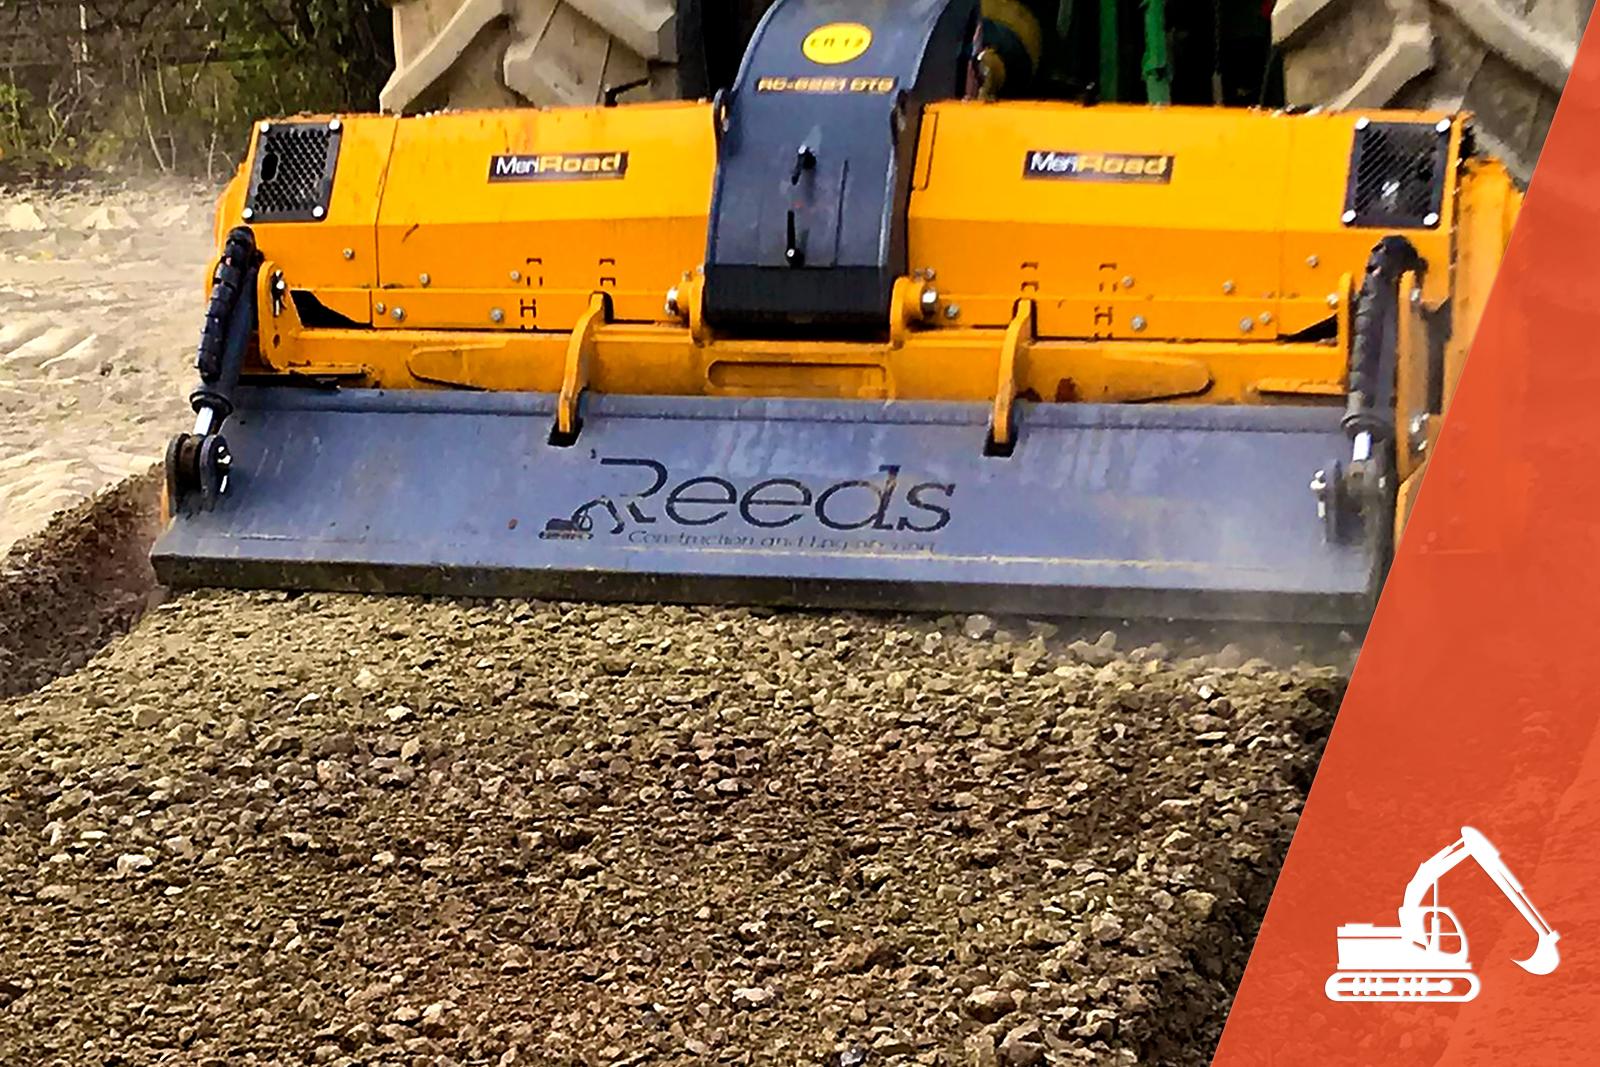 Reeds track stabilisation vehicle on track